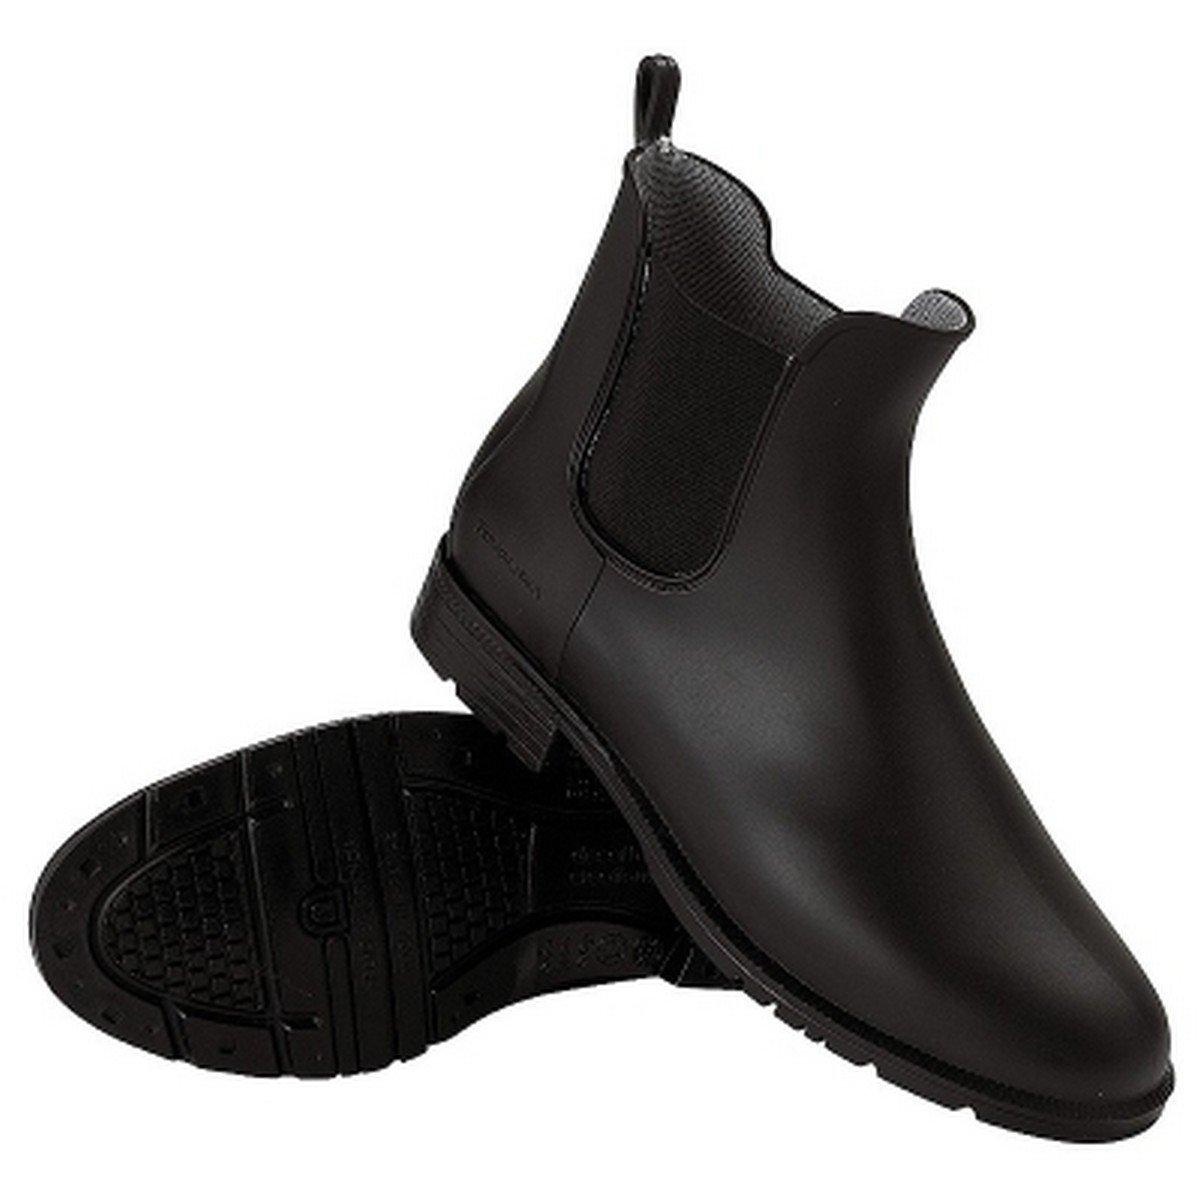 Fouganz Schooling Adult Child Horse Riding Jodhpur Boots Black Supple Waterproof